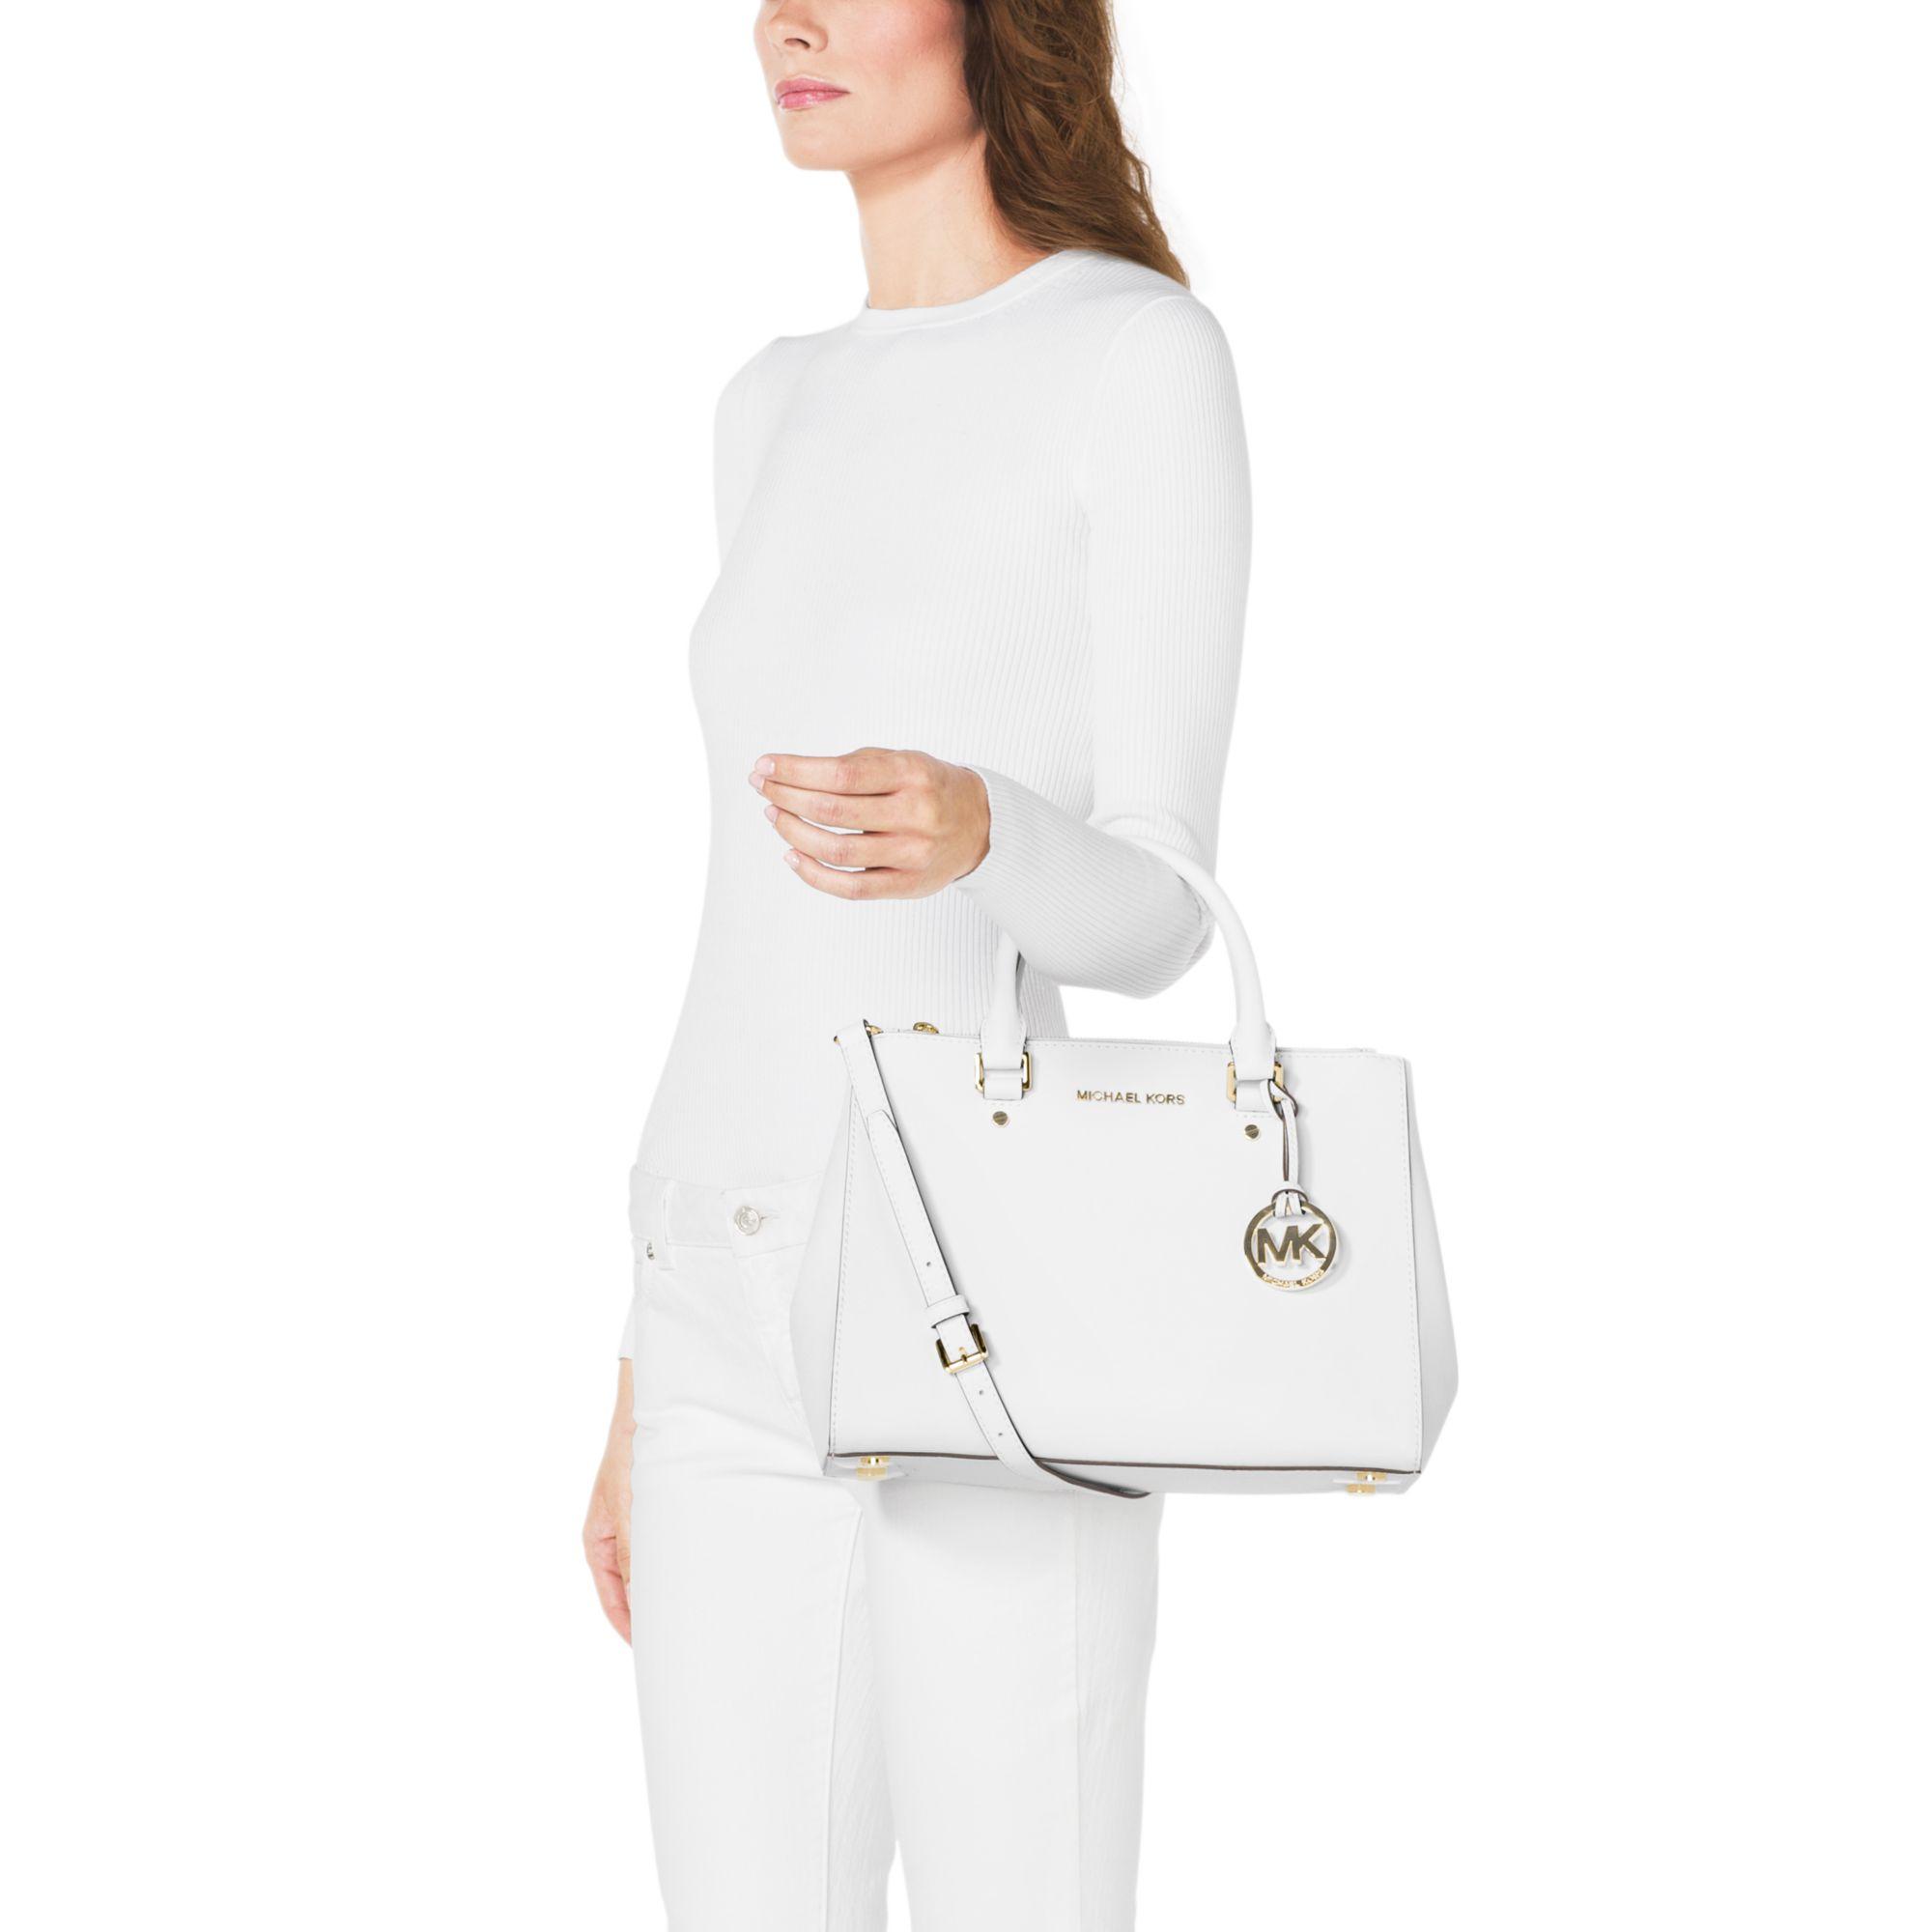 83106f13bfb18c Michael Kors Sutton Medium Saffiano Leather Satchel in White - Lyst